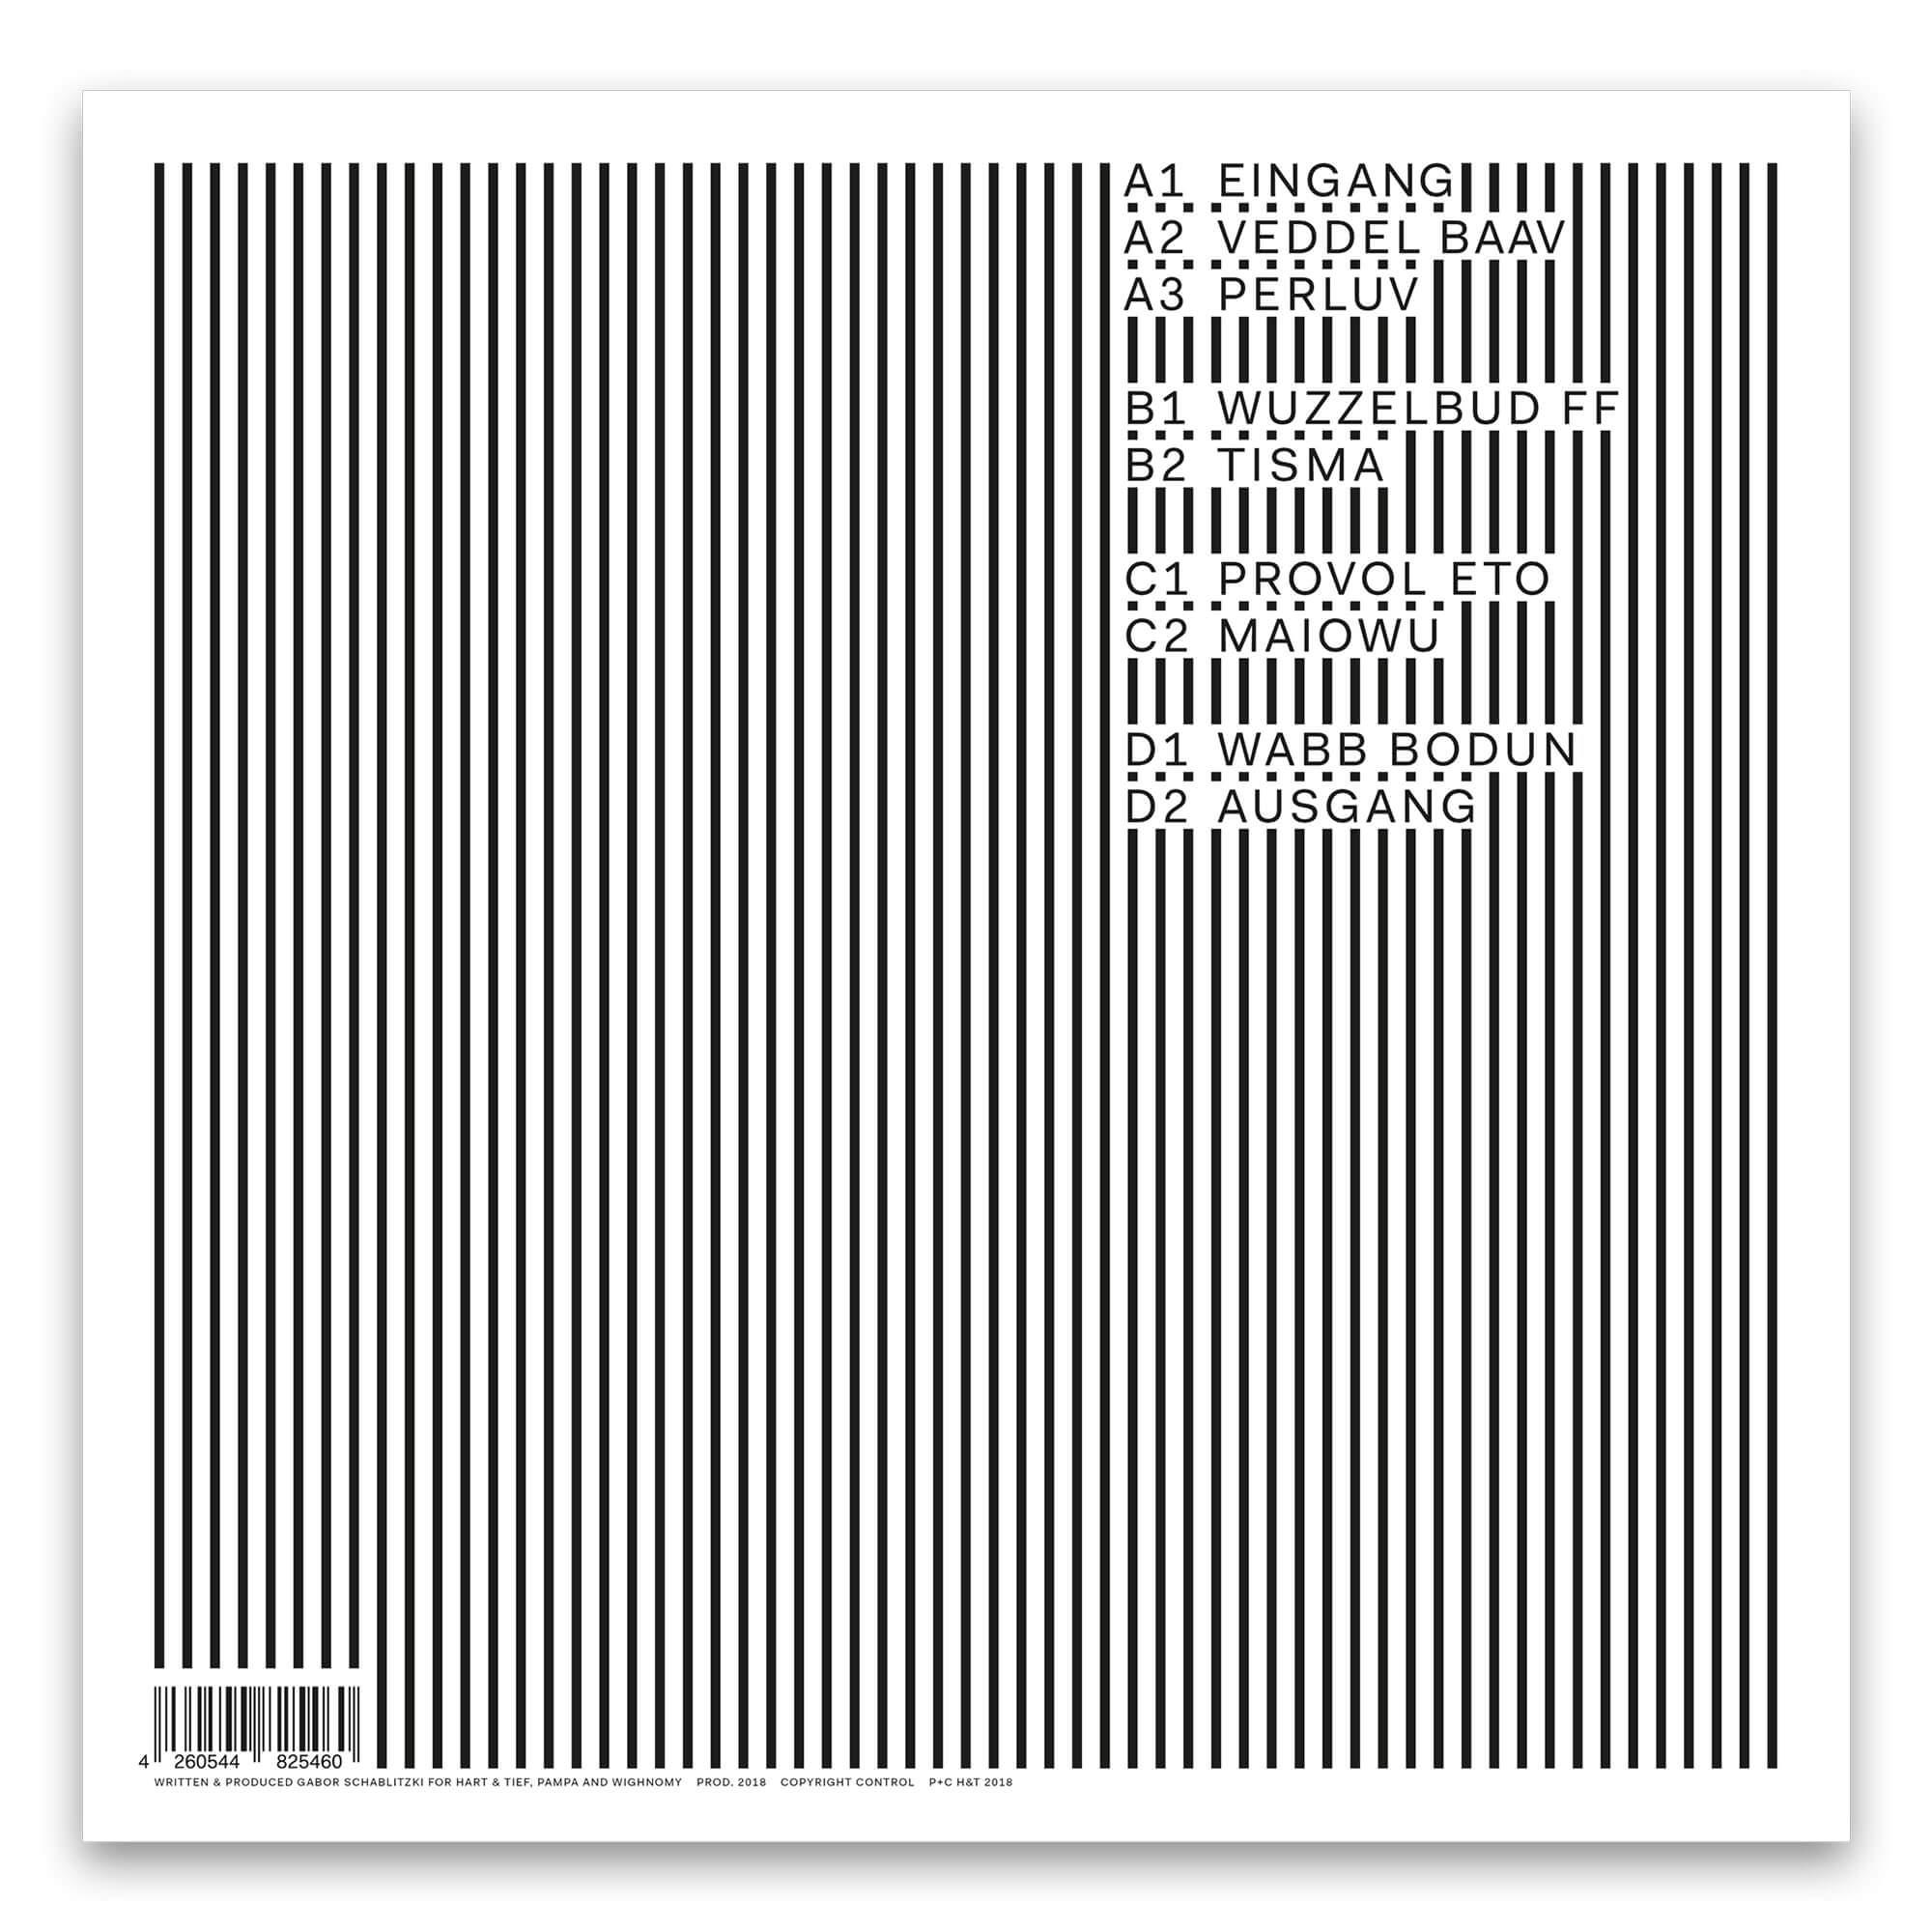 H-T-LP-01-Sleeve-back